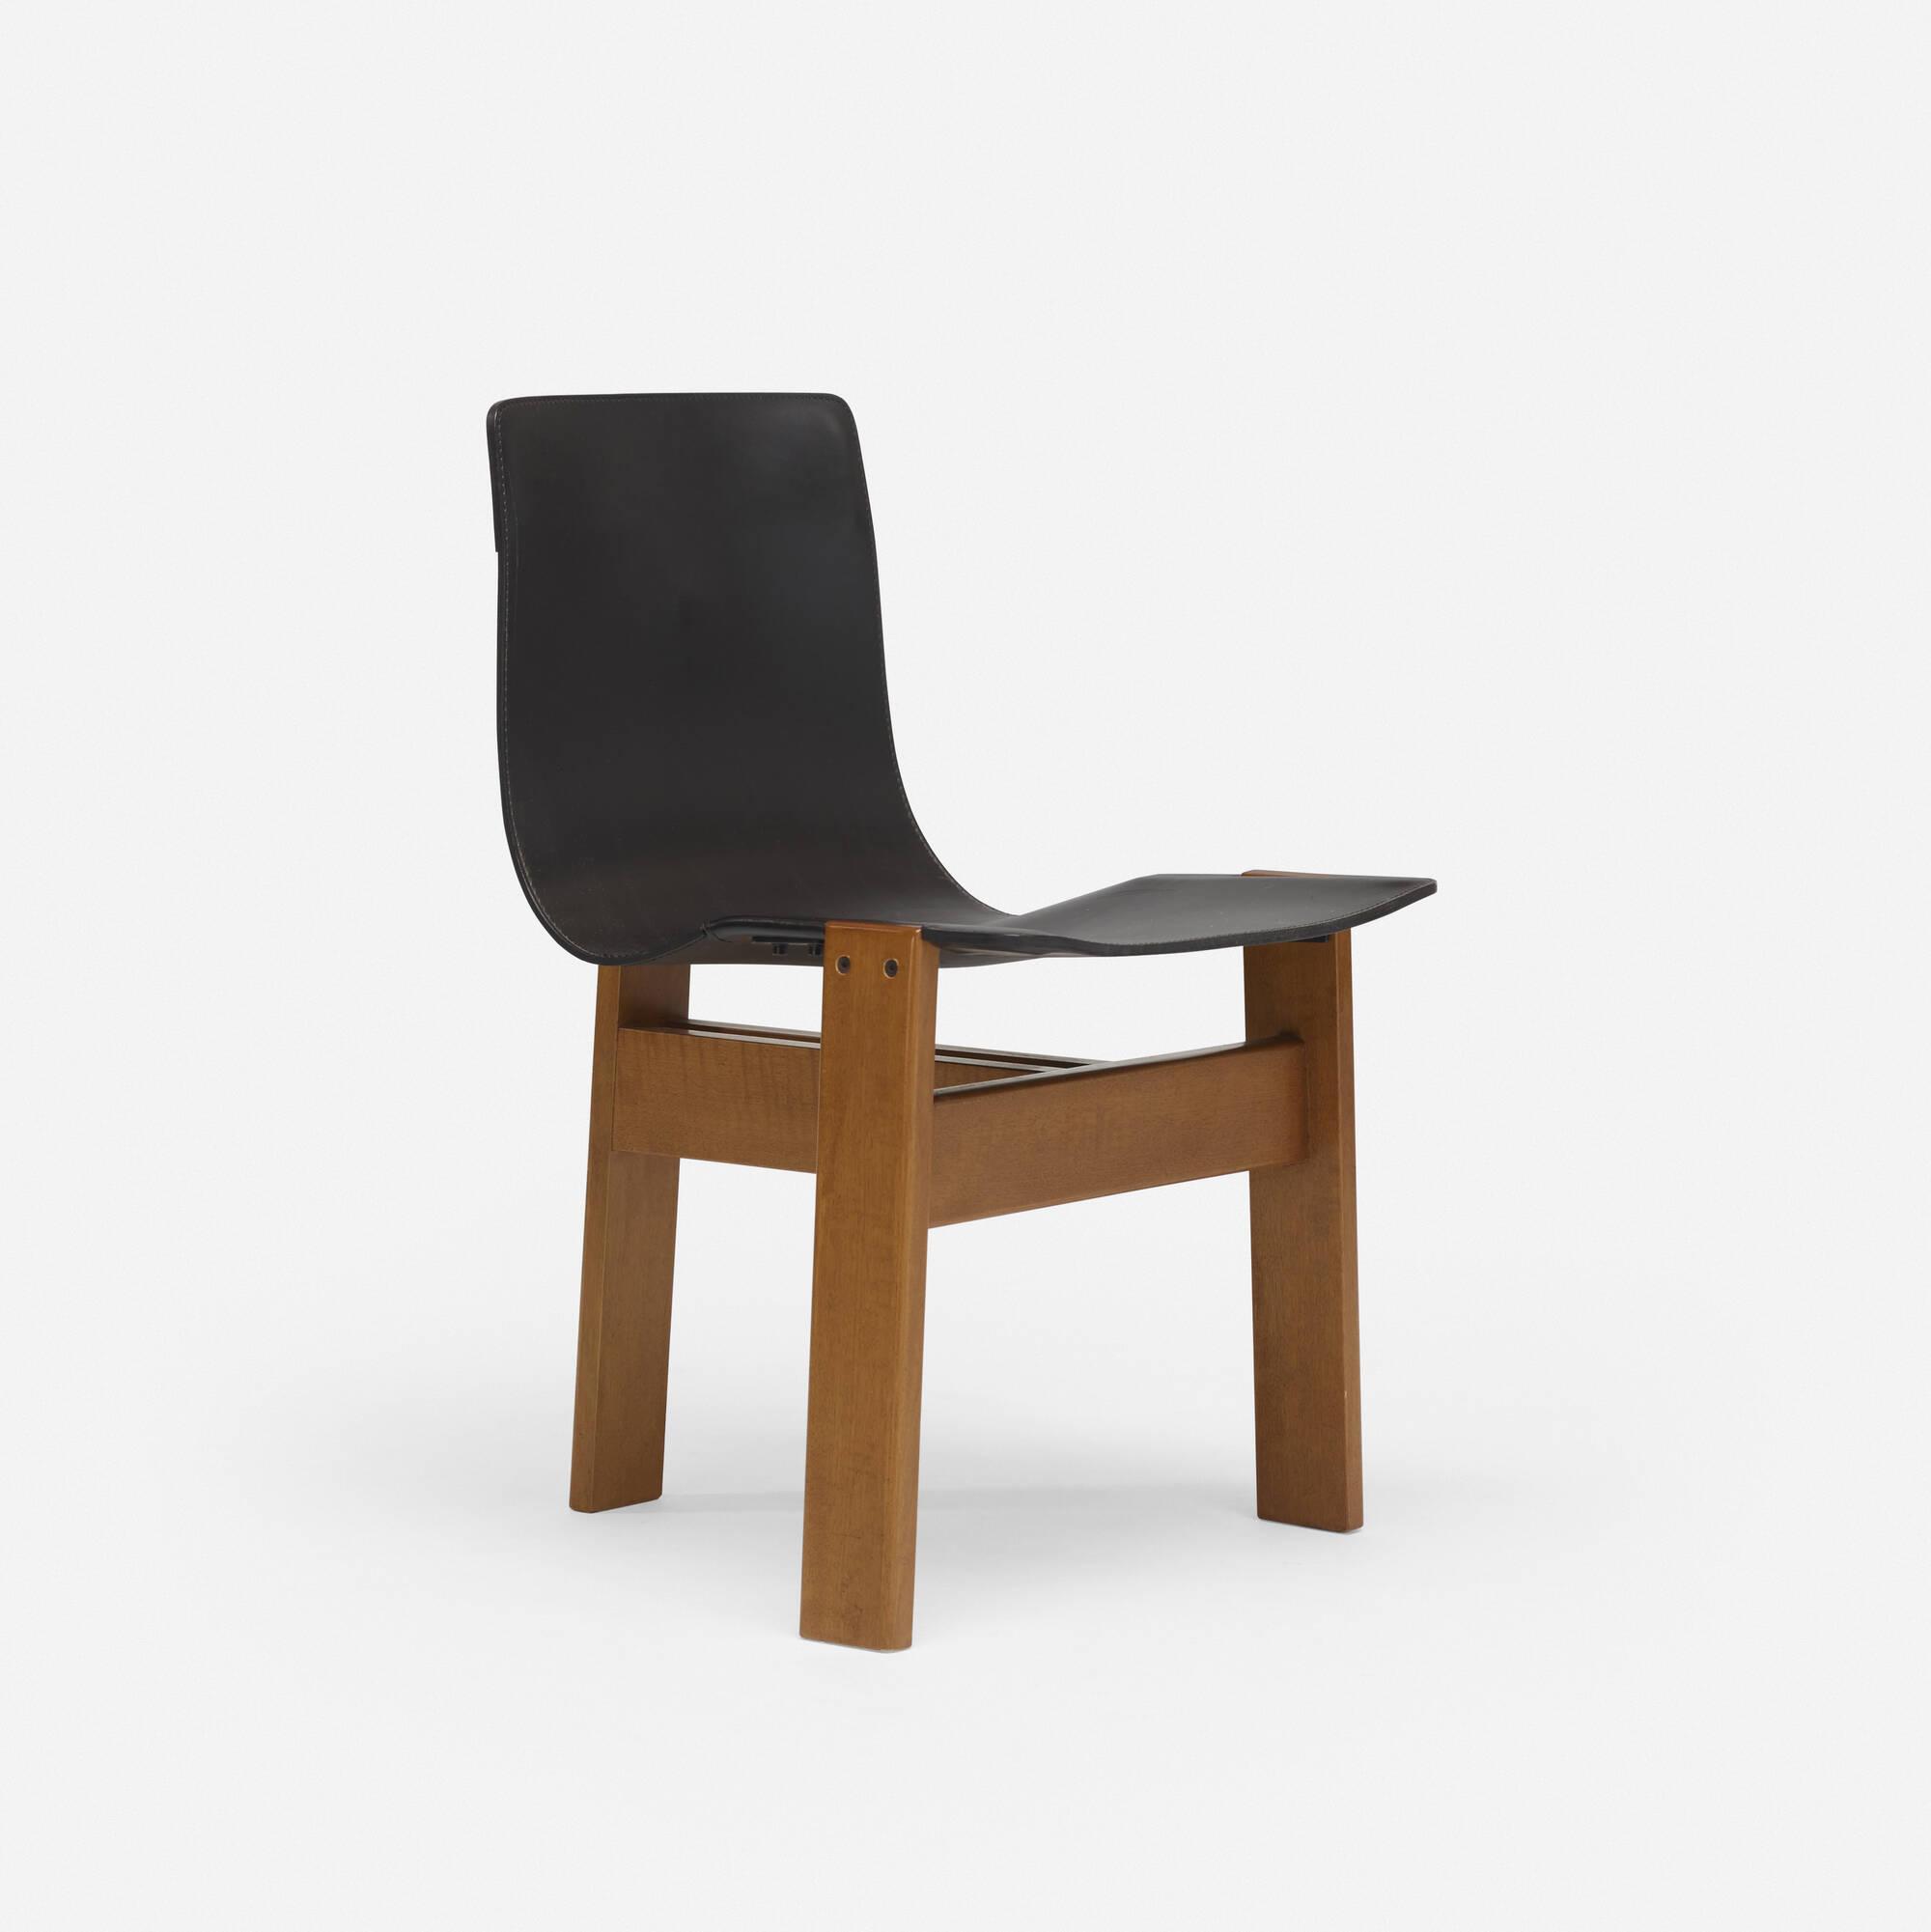 527: Angelo Mangiarotti / Tre 3 dining chair (1 of 3)